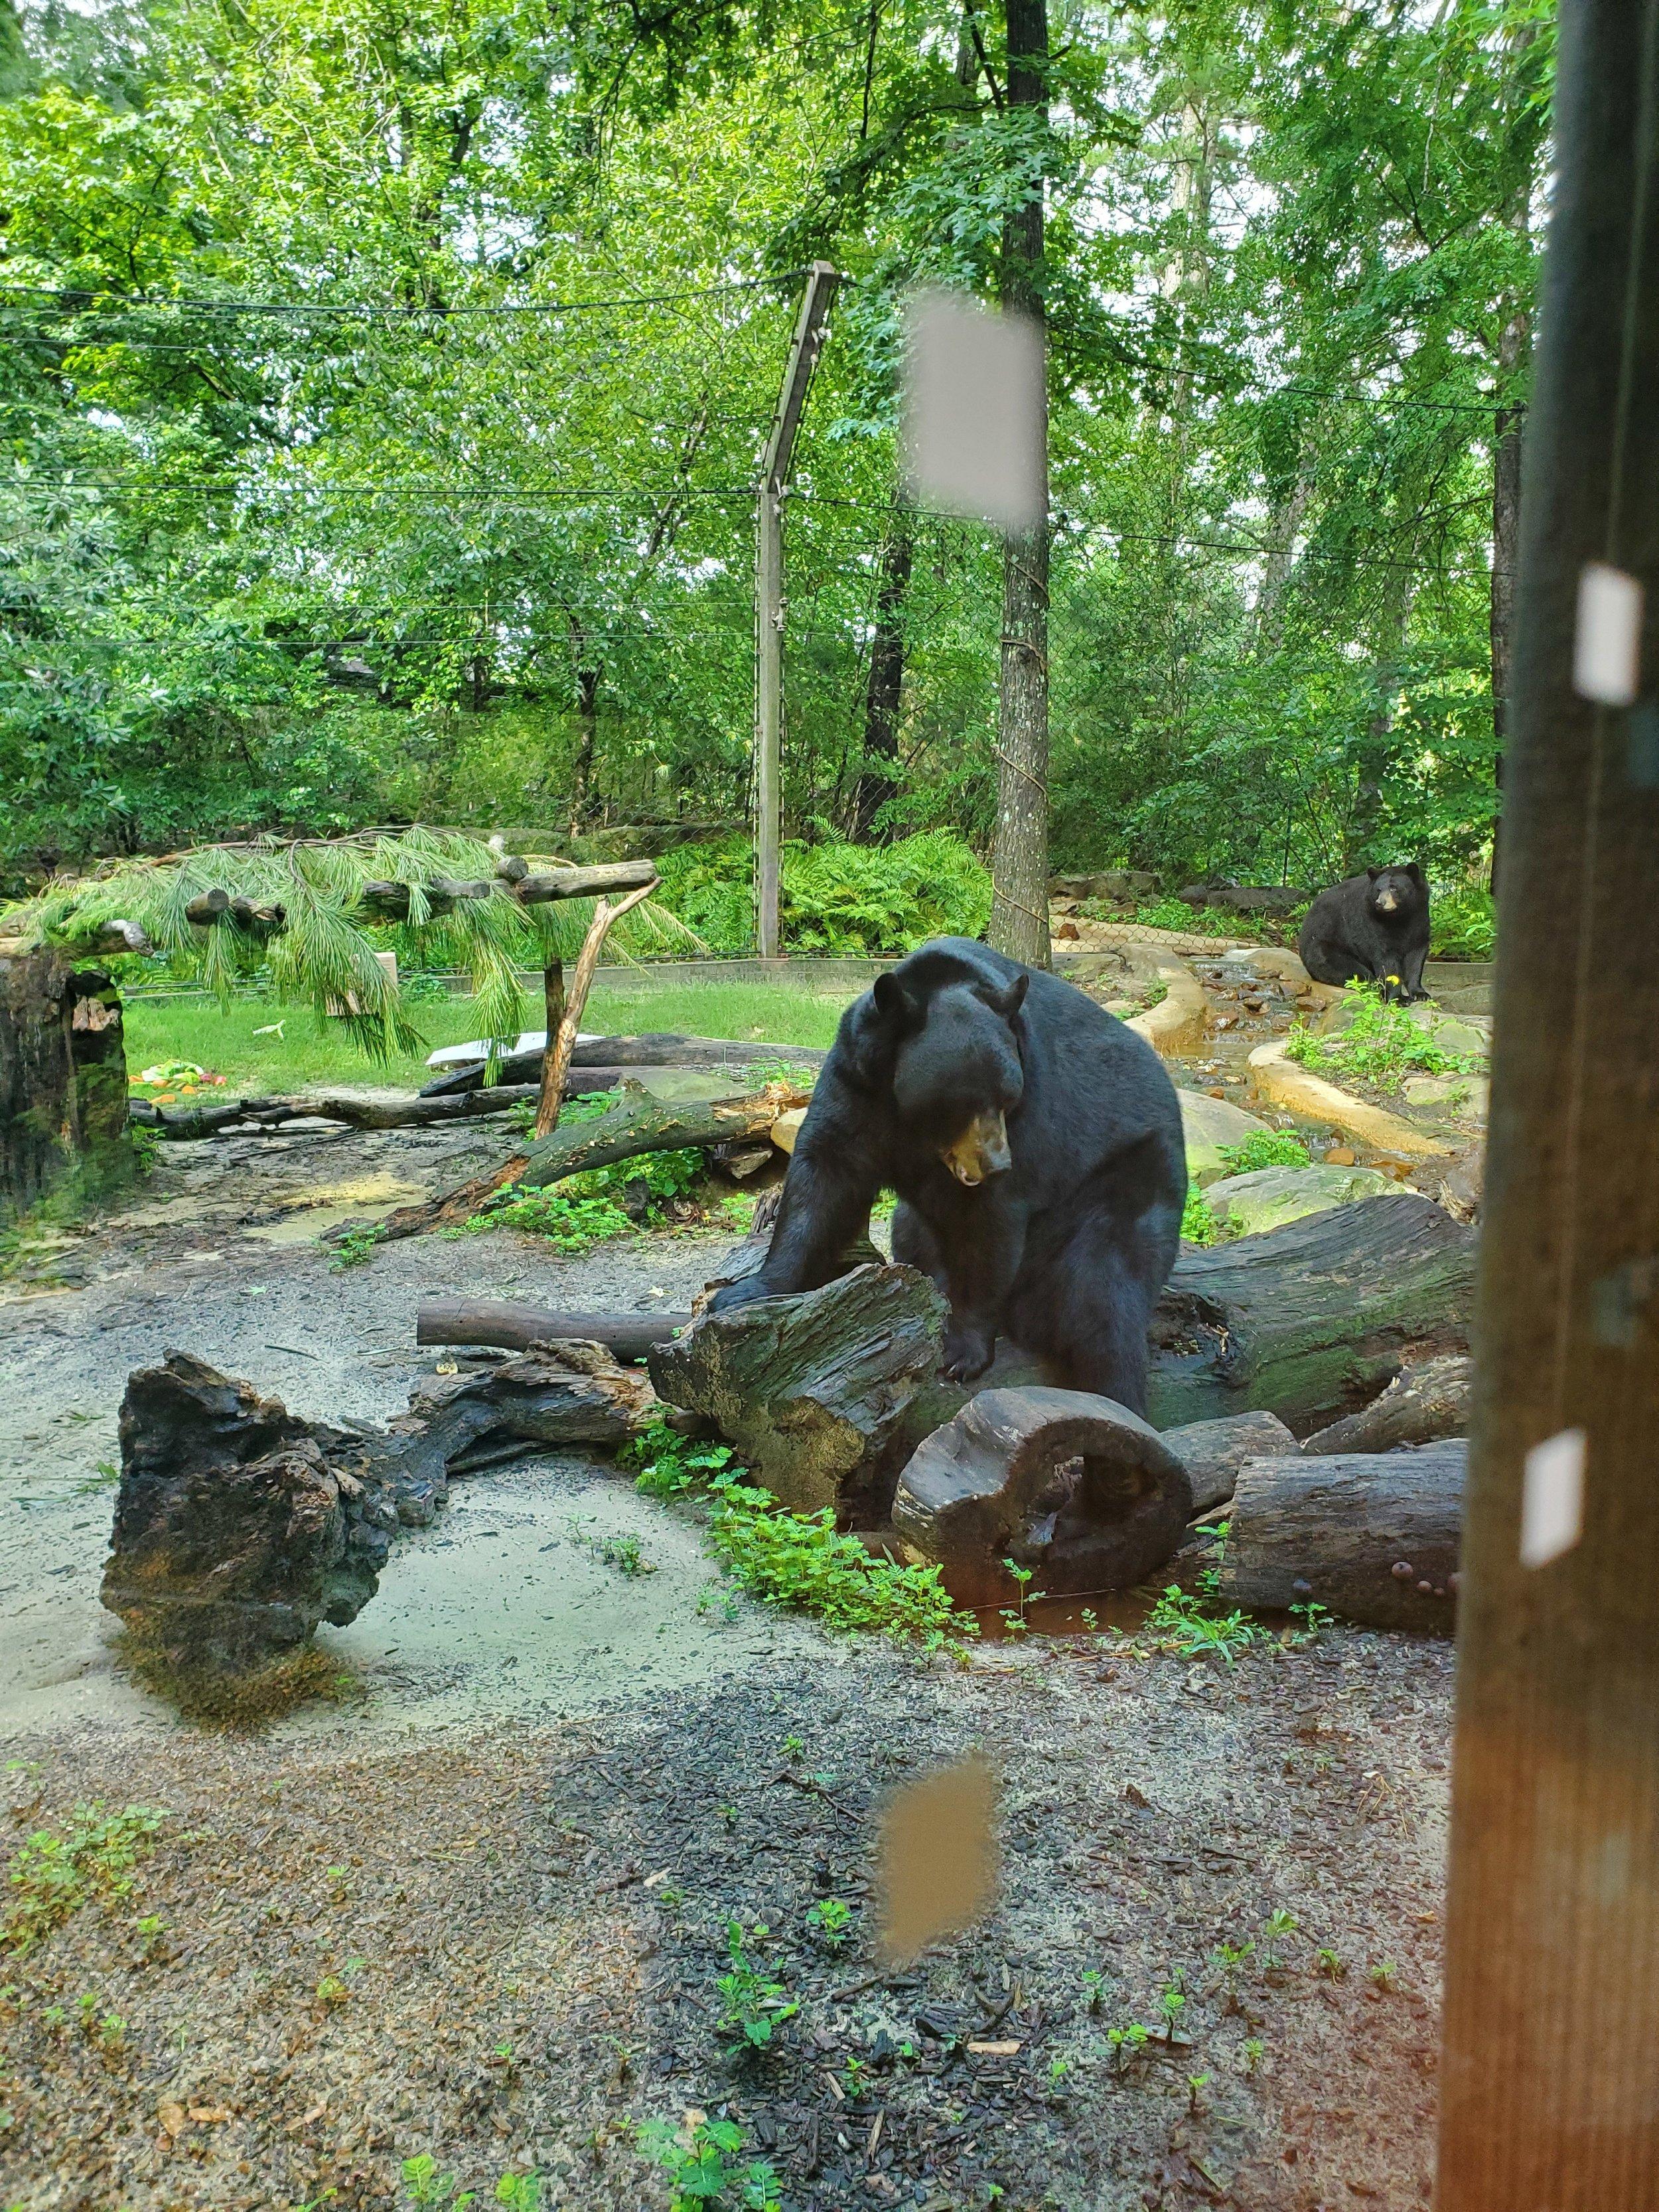 Small black bear exhibit